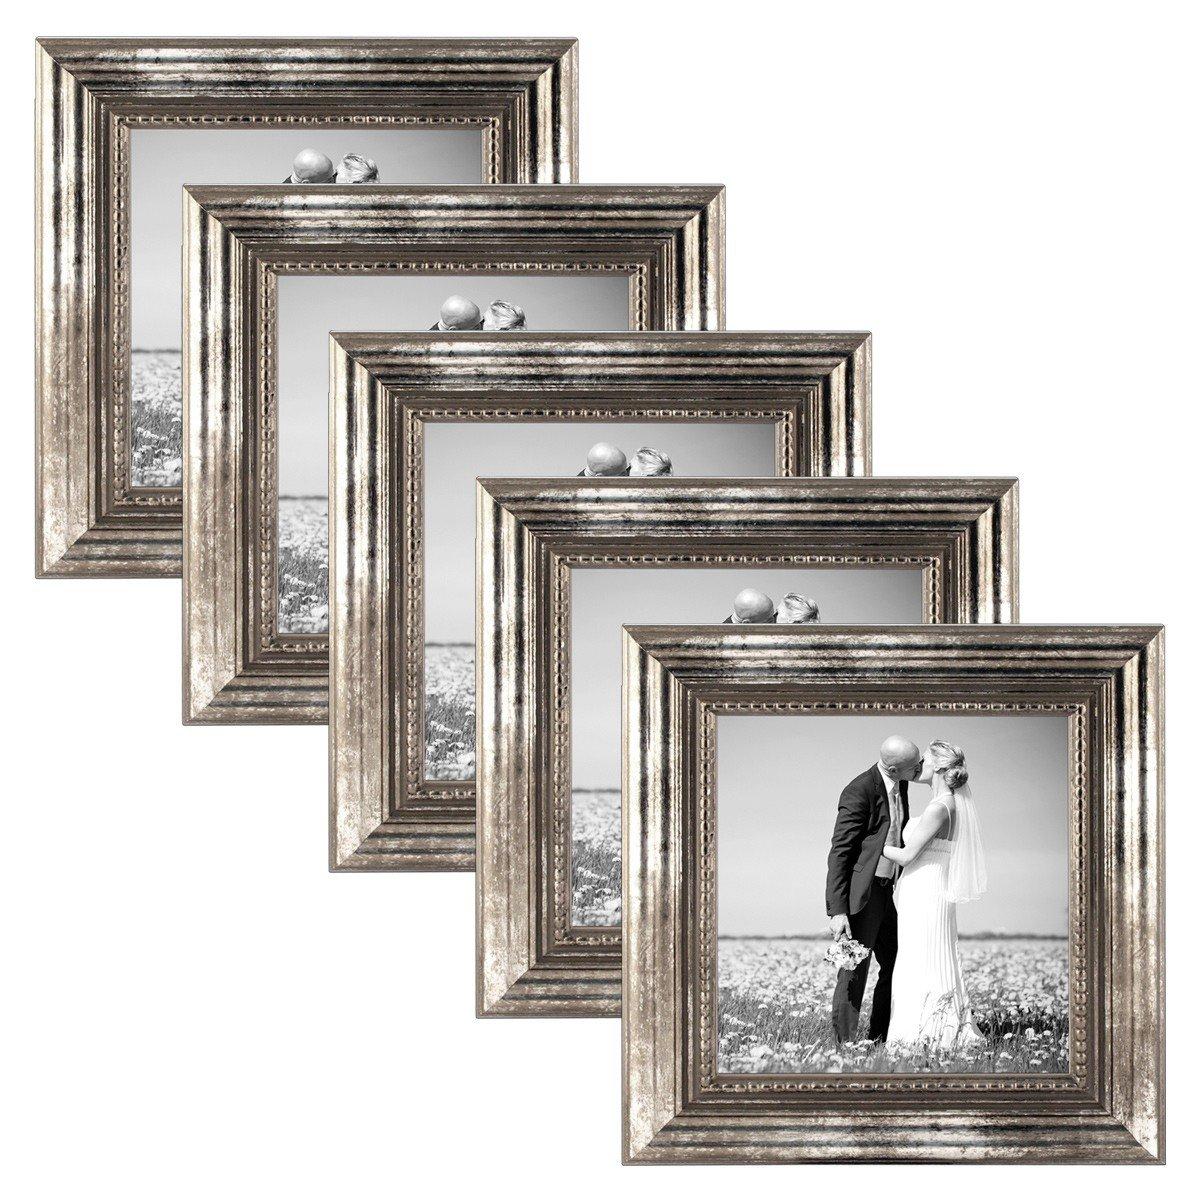 PHOTOLINI 5er Set Set Set Bilderrahmen 21x30 cm DIN A4 Silber Barock Antik Massivholz mit Glasscheibe und Zubehör Fotorahmen Barock-Rahmen 0fd137